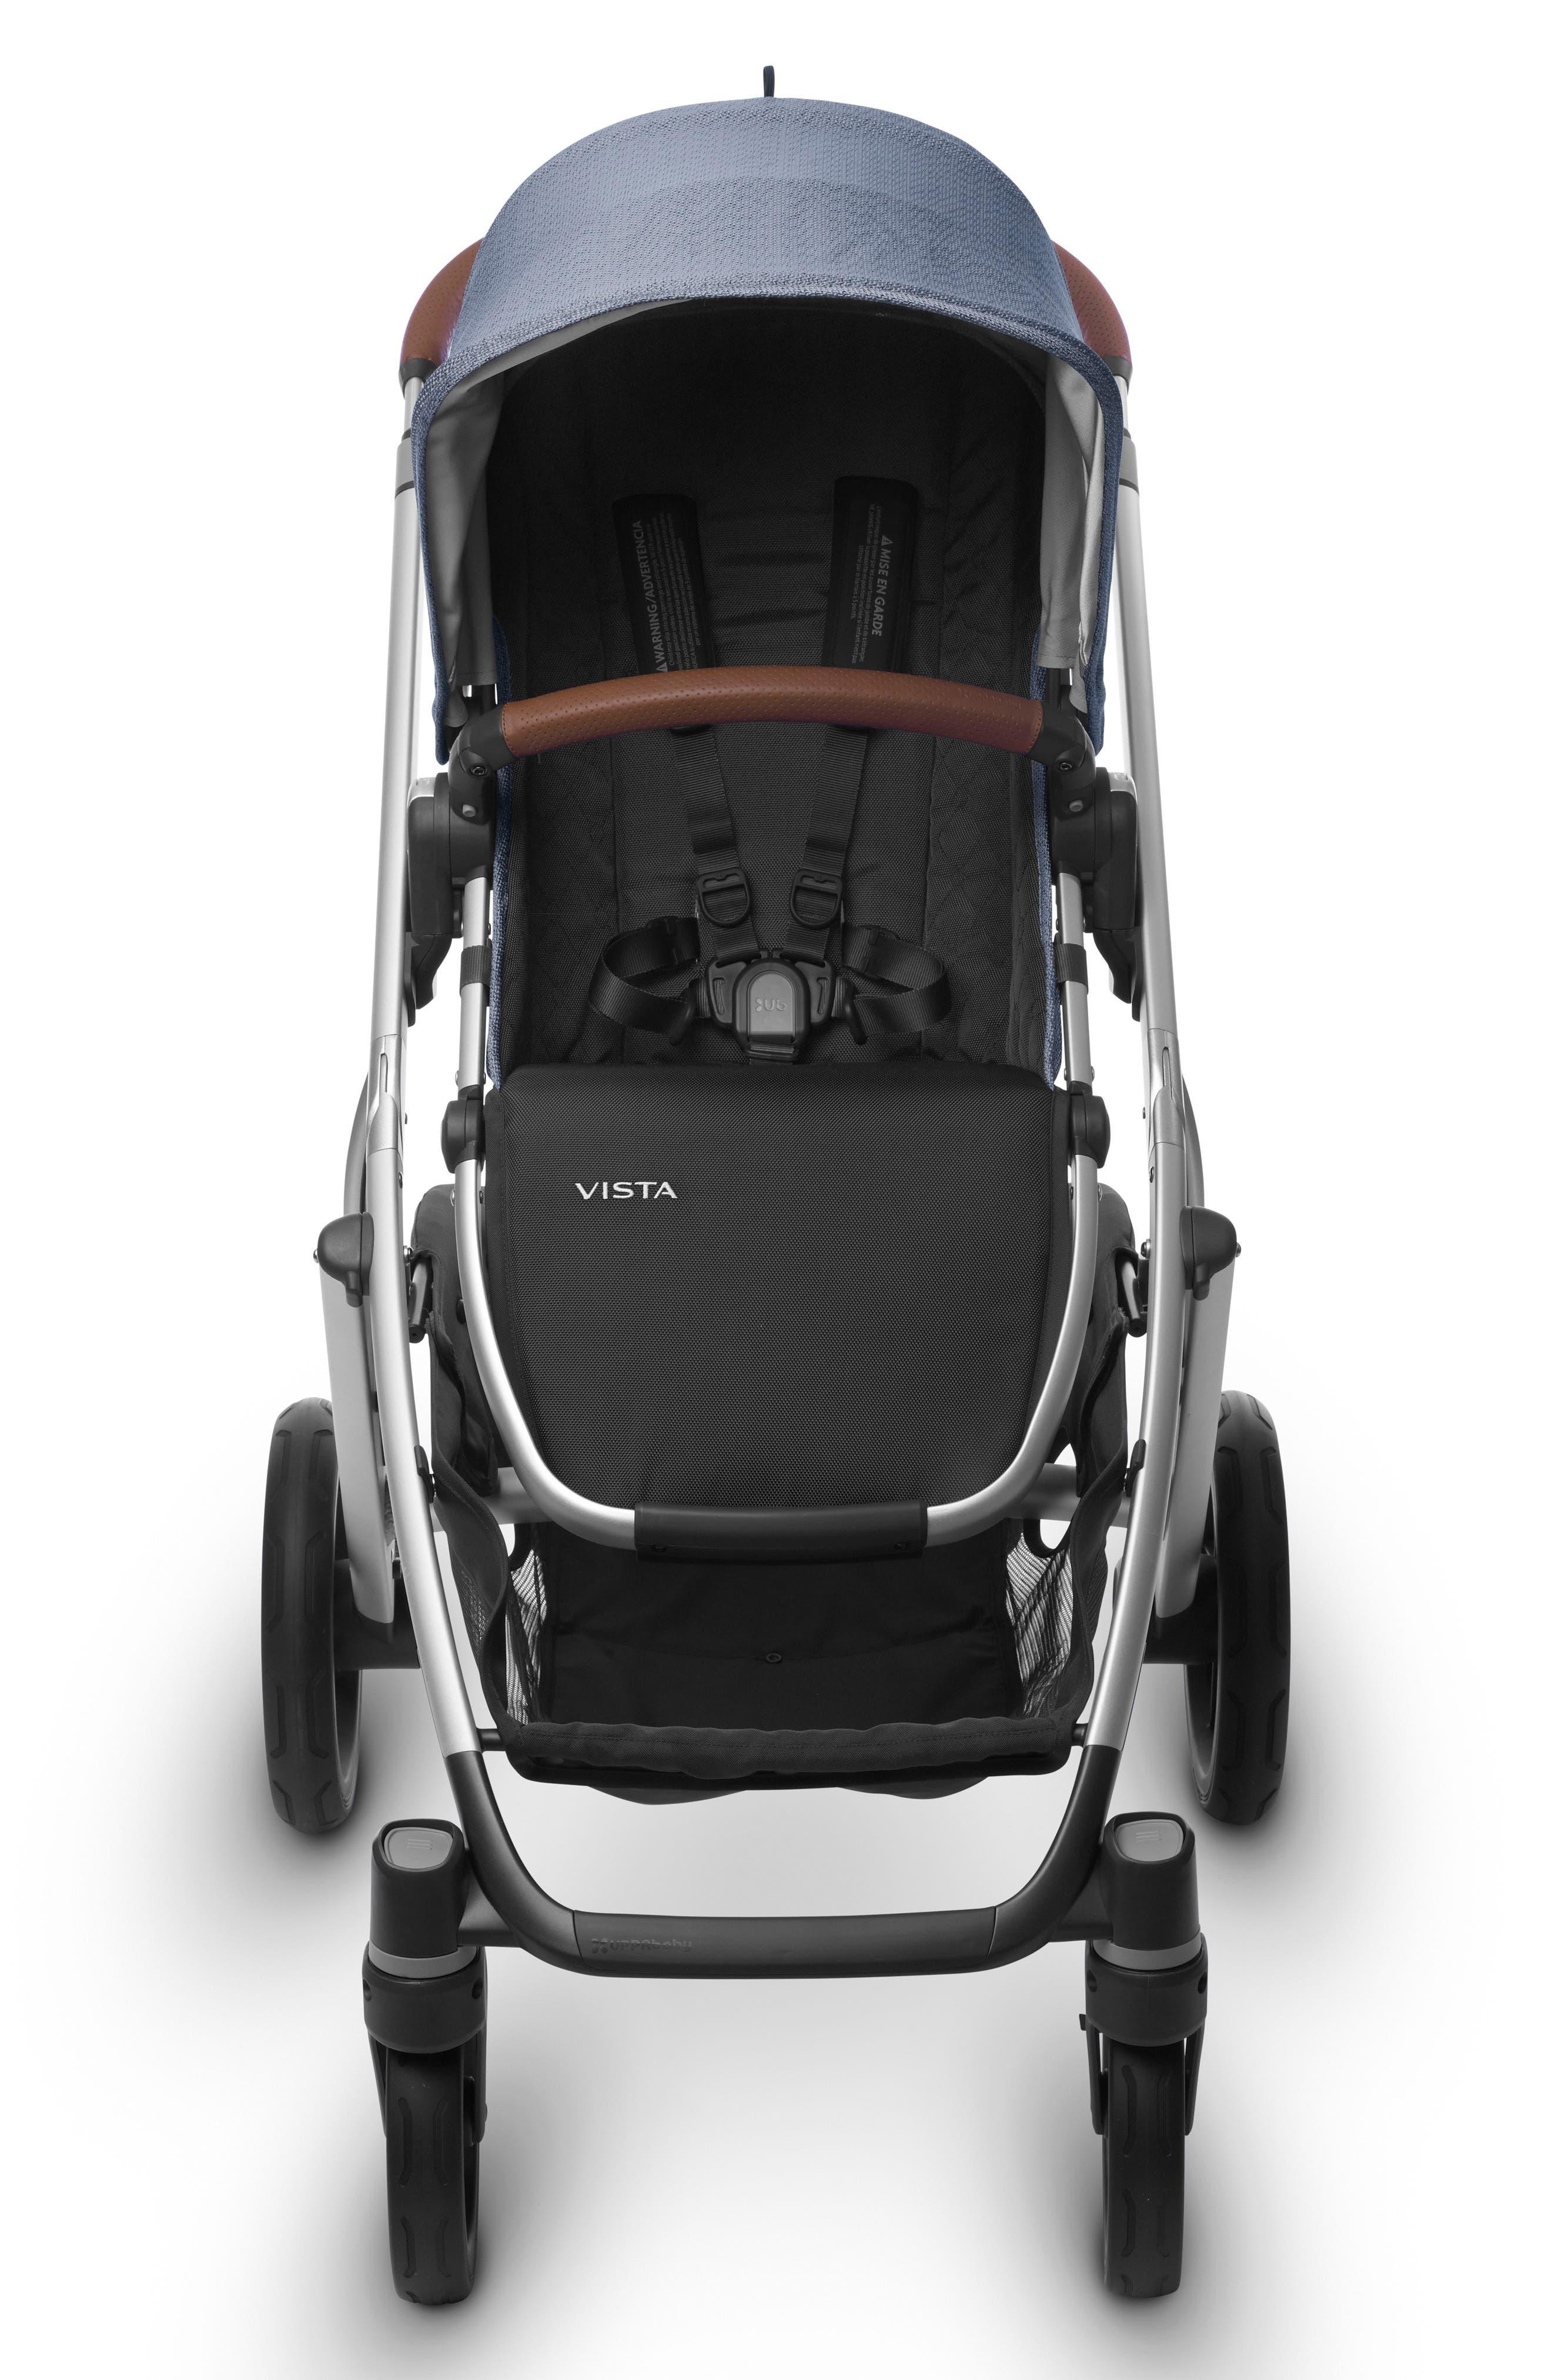 2017 VISTA Henry Aluminum Frame Convertible Stroller with Bassinet & Toddler Seat,                             Alternate thumbnail 6, color,                             Blue Marl